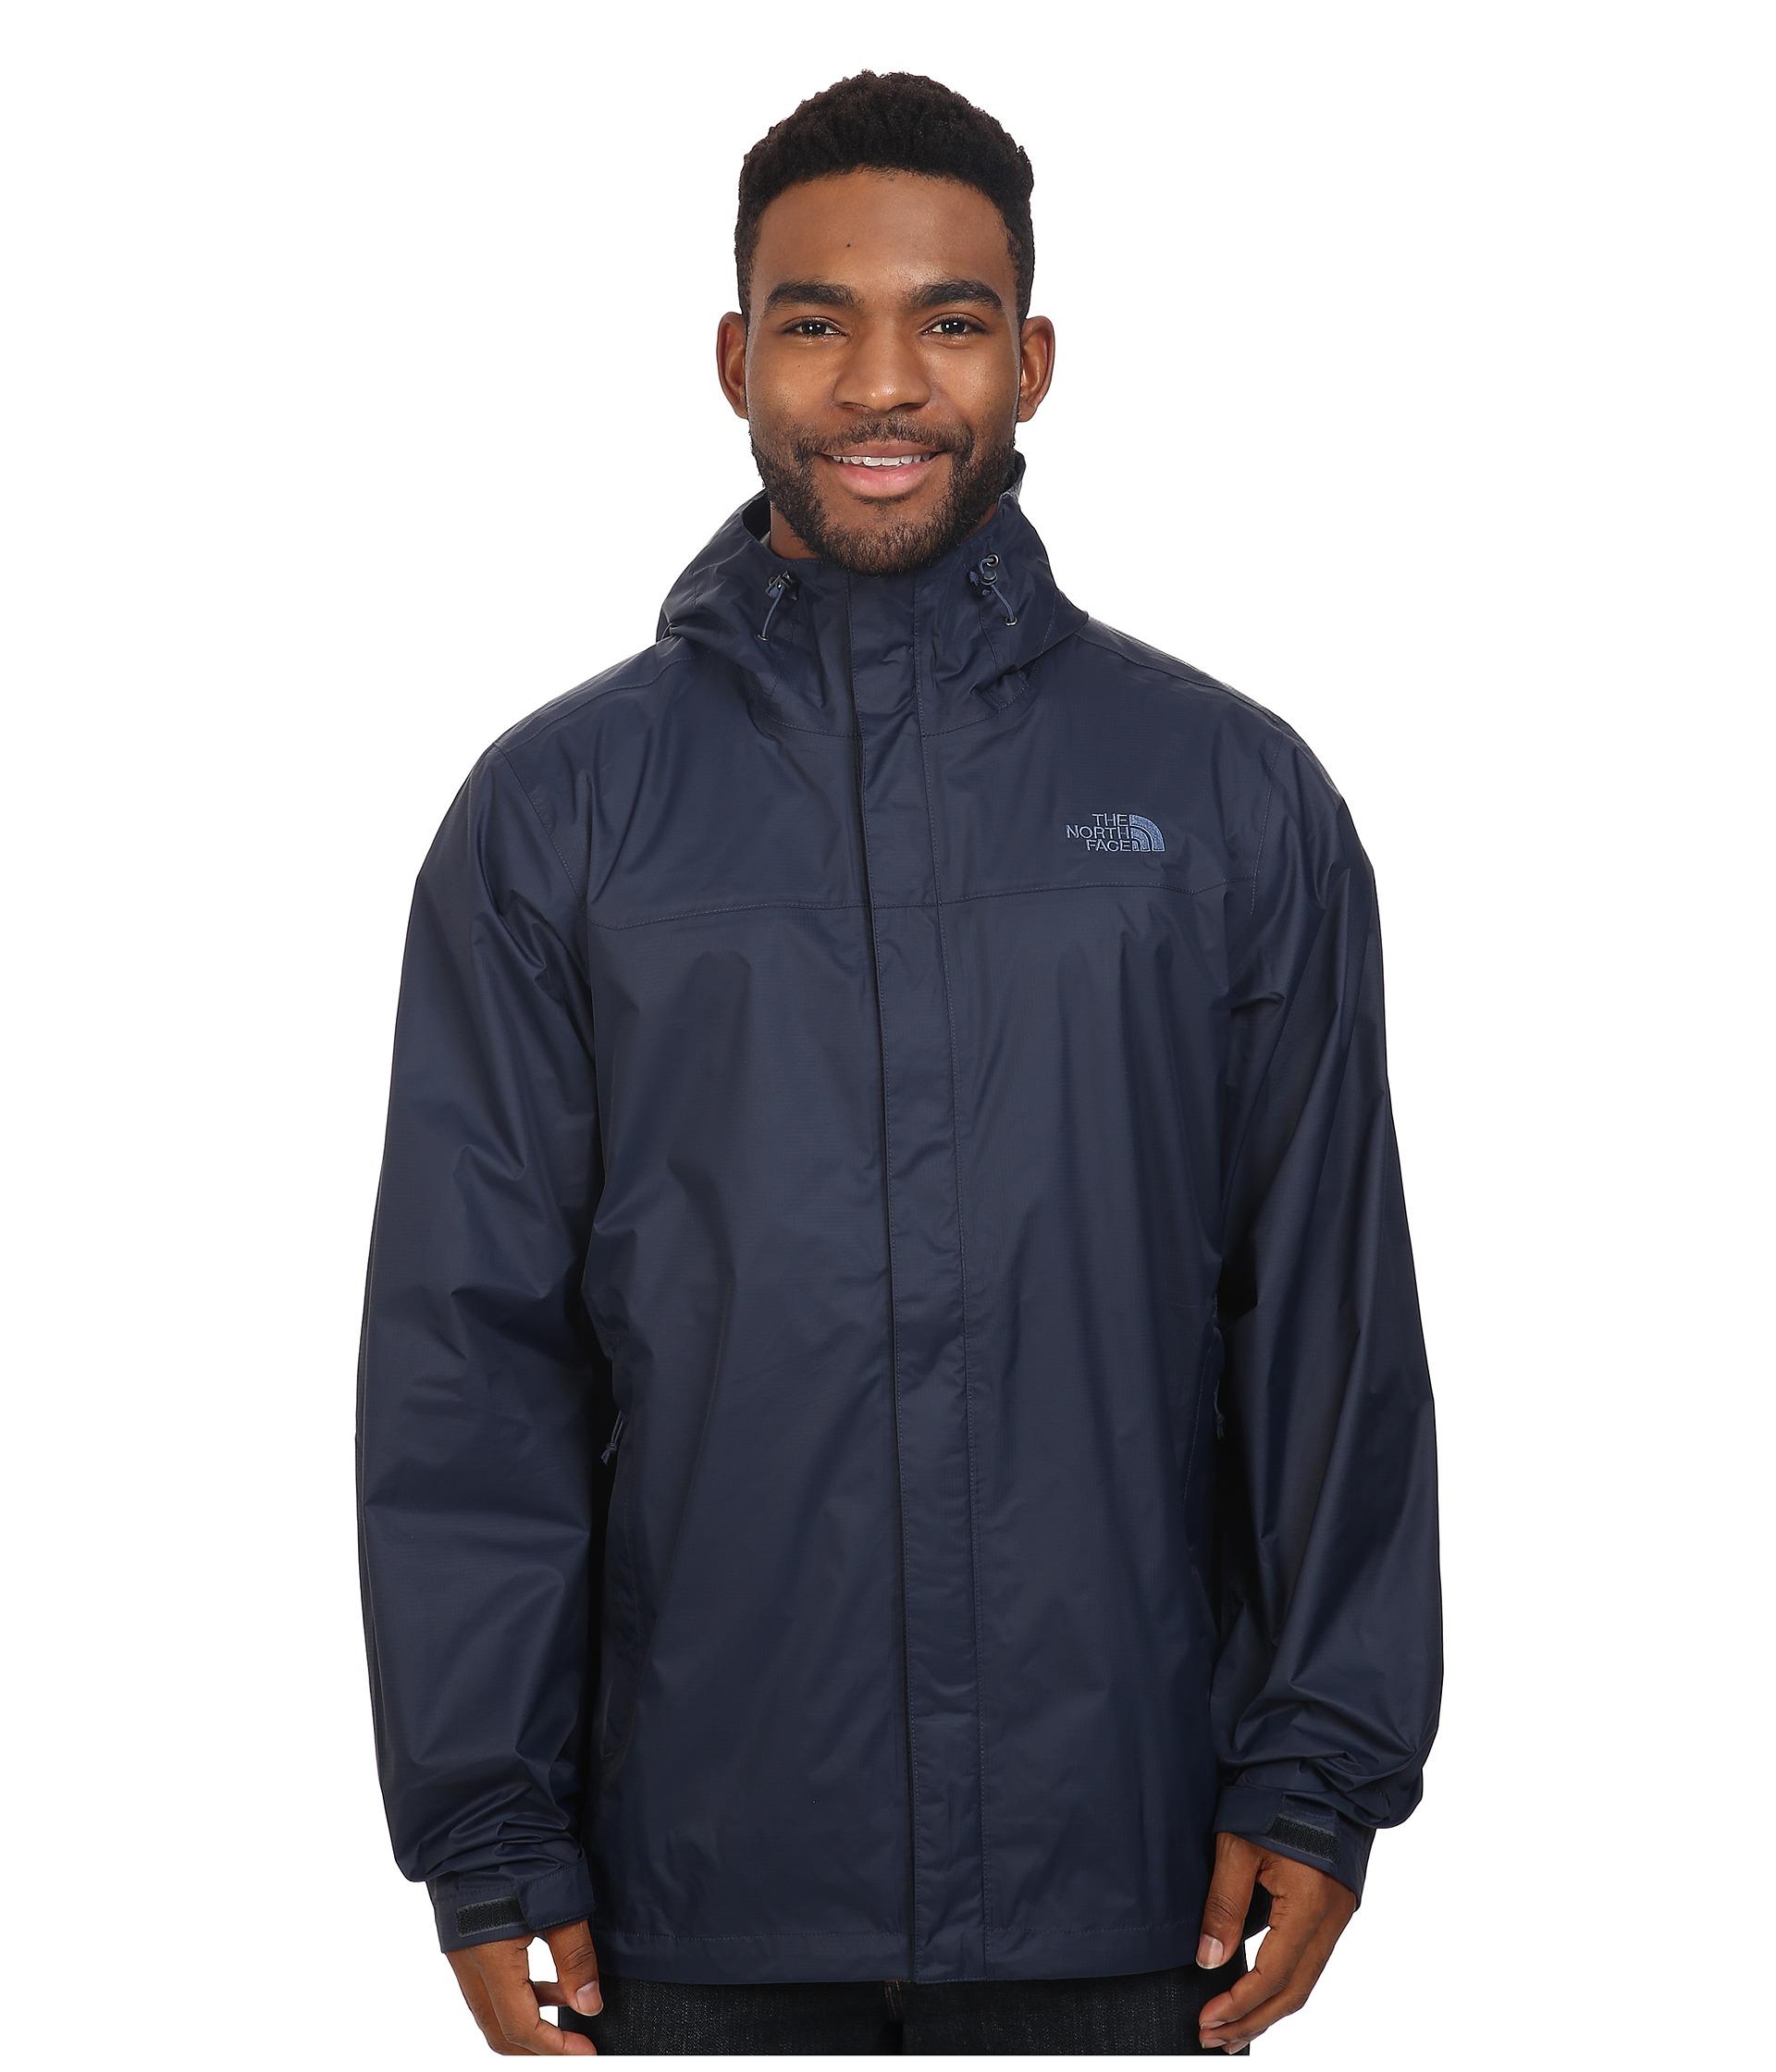 north face men s venture rain jacket sale - Marwood VeneerMarwood Veneer 491e846d1